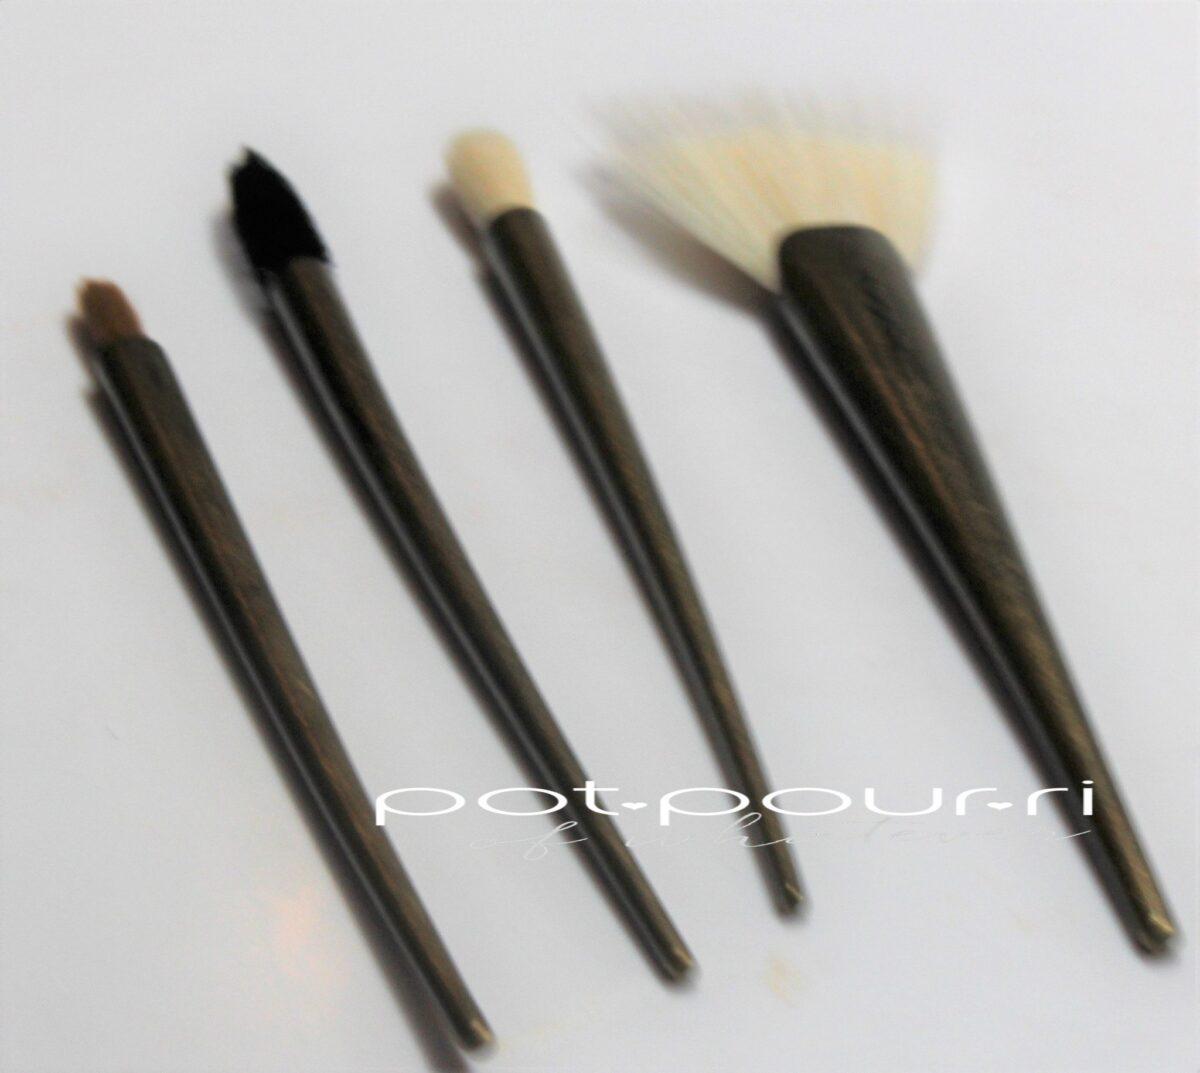 Four brushes in brush roll